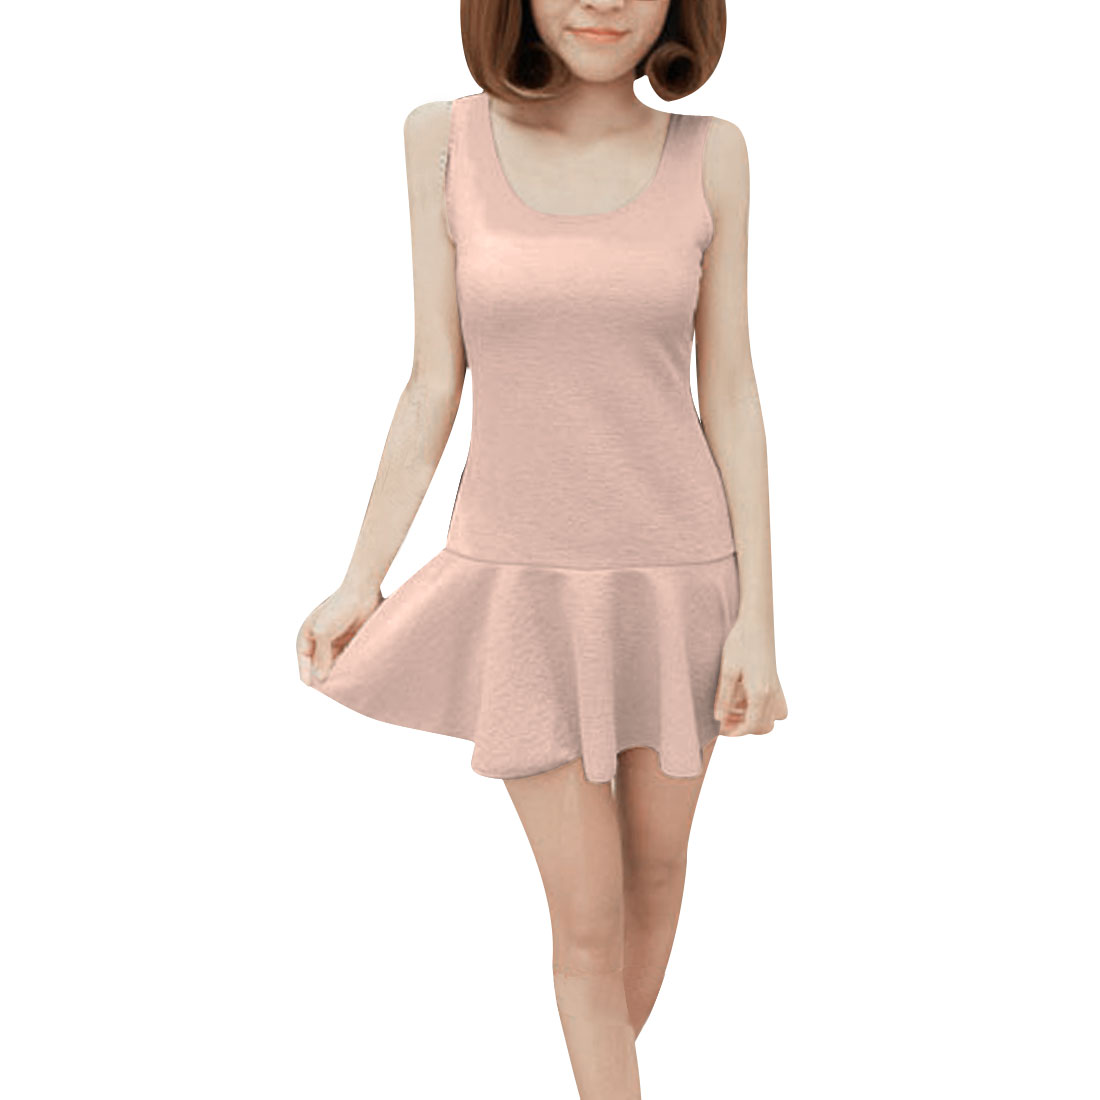 Women Scoop Neck Sleeveless Flouncing Hem Mini Dress Beige XS